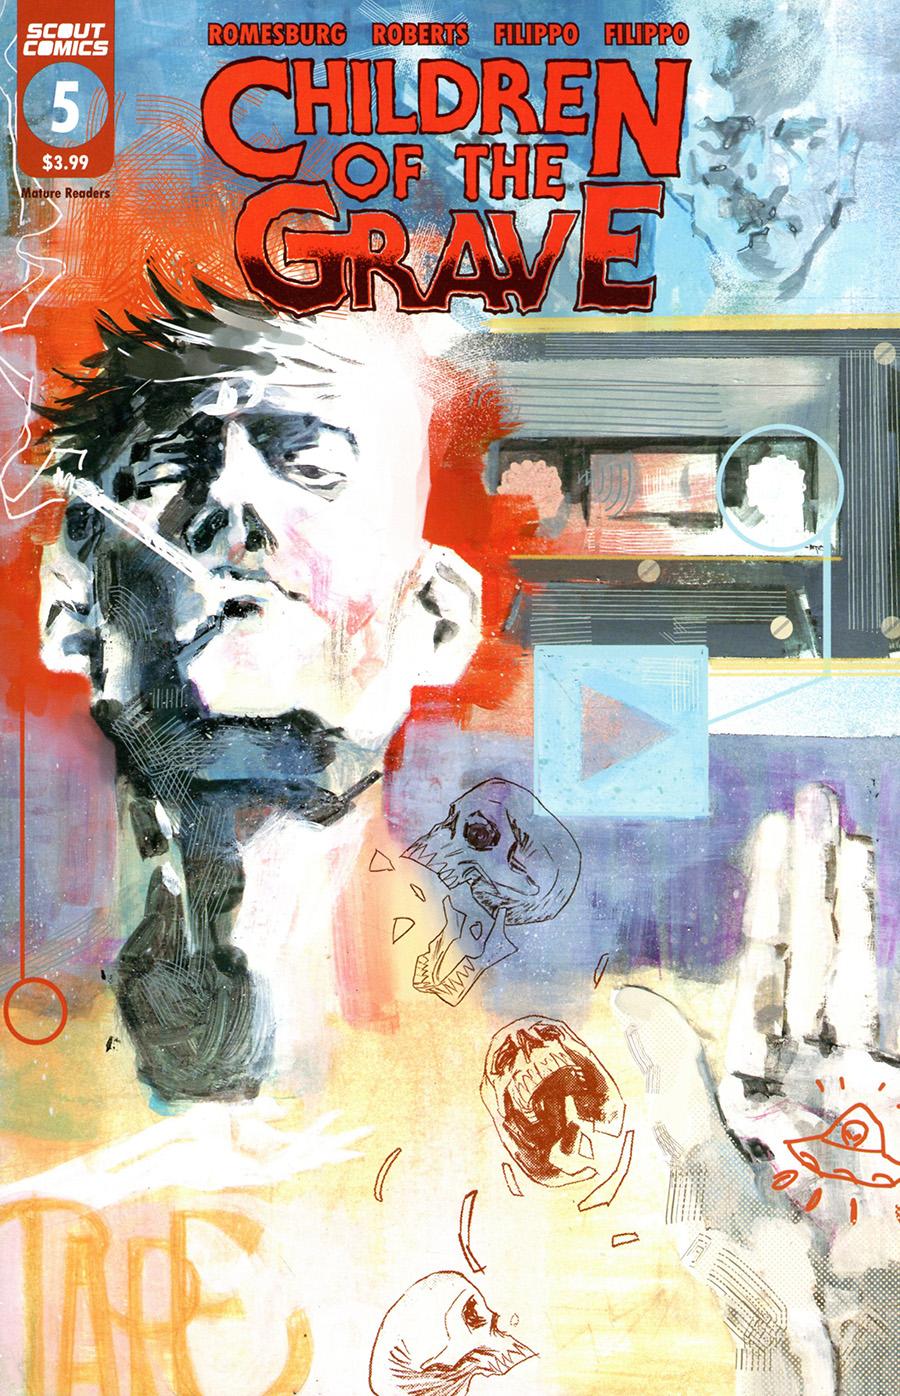 Children Of The Grave (Scout Comics) #5